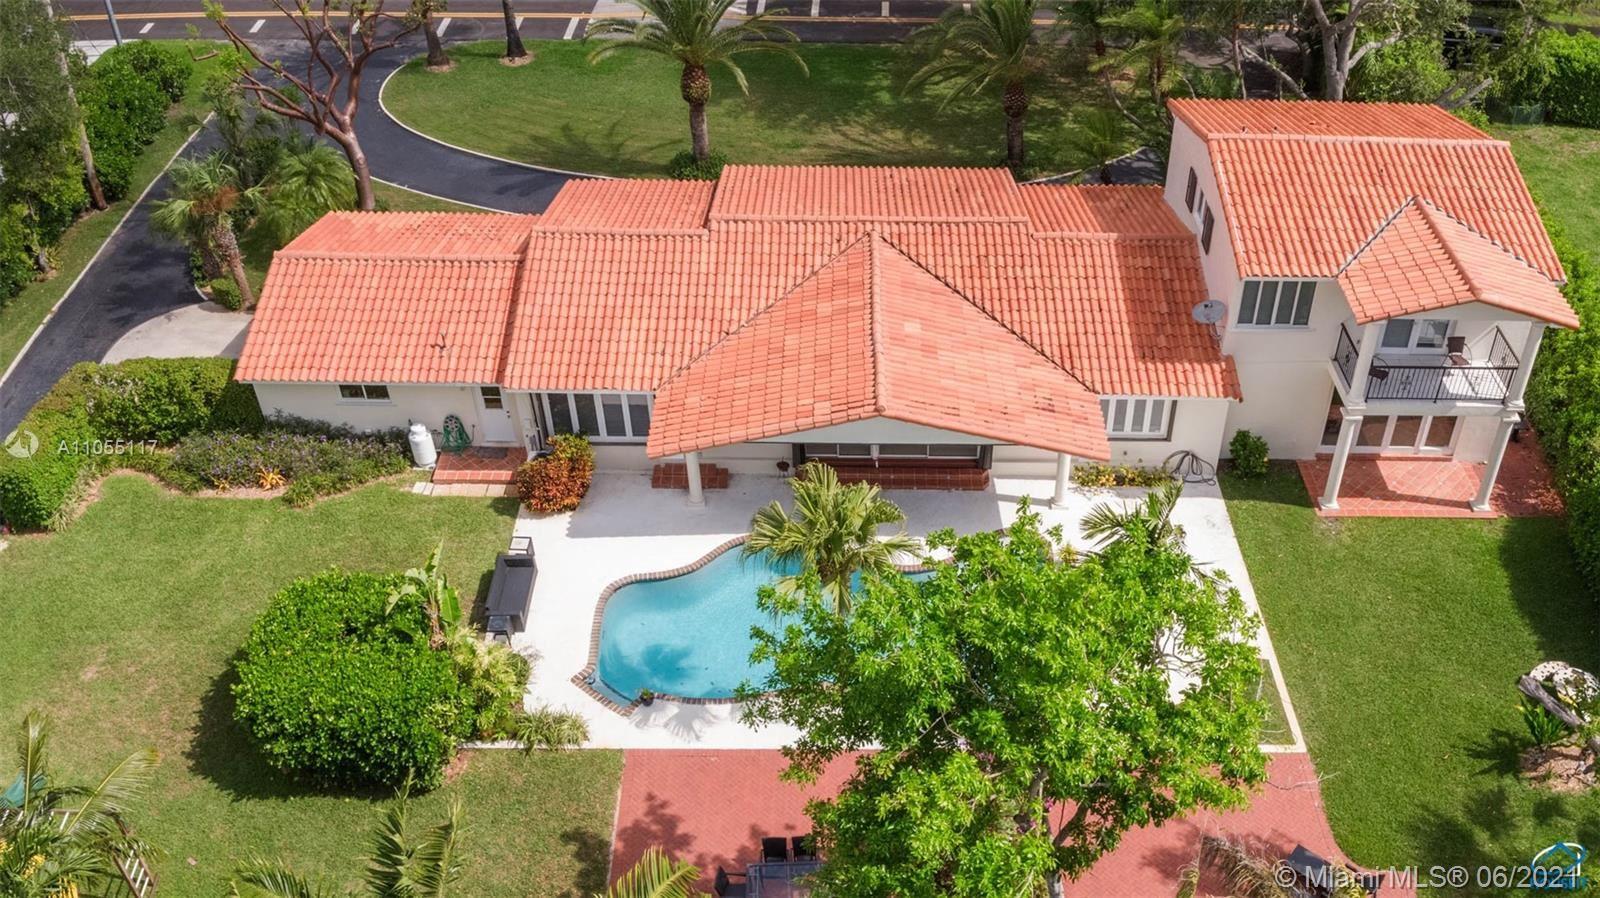 Photo of 5940 SW 79 St, South Miami, FL 33143 (MLS # A11055117)